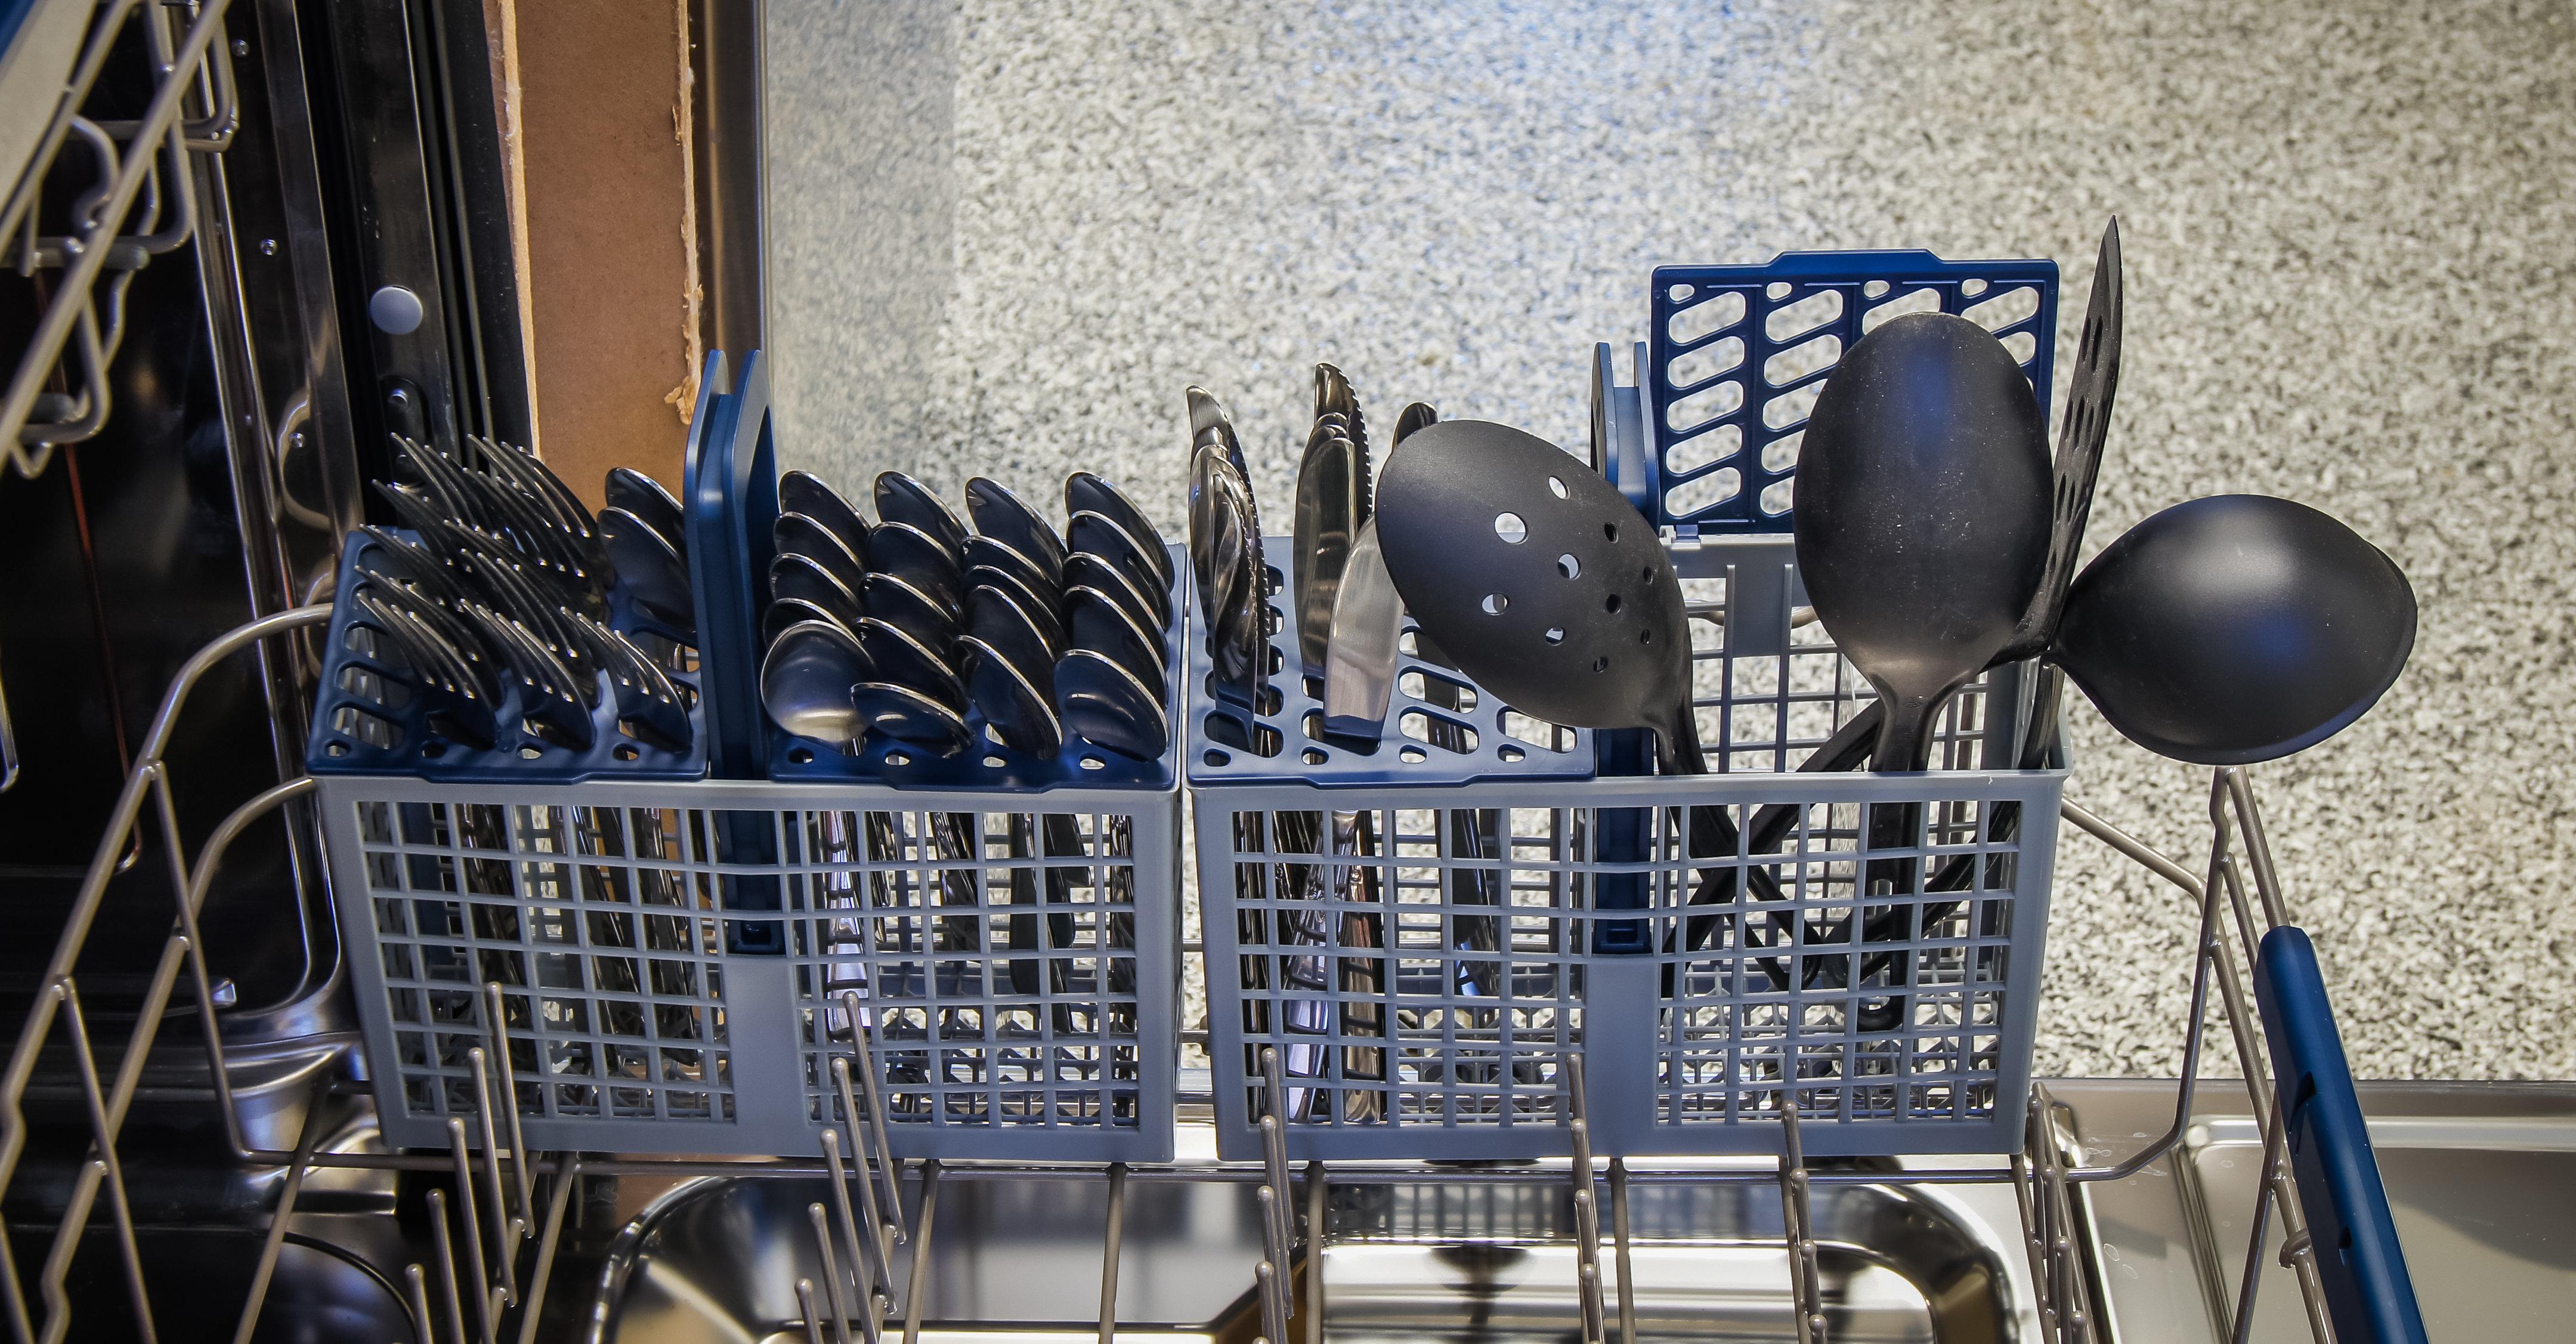 Samsung DW80H9970US cutlery basket capacity